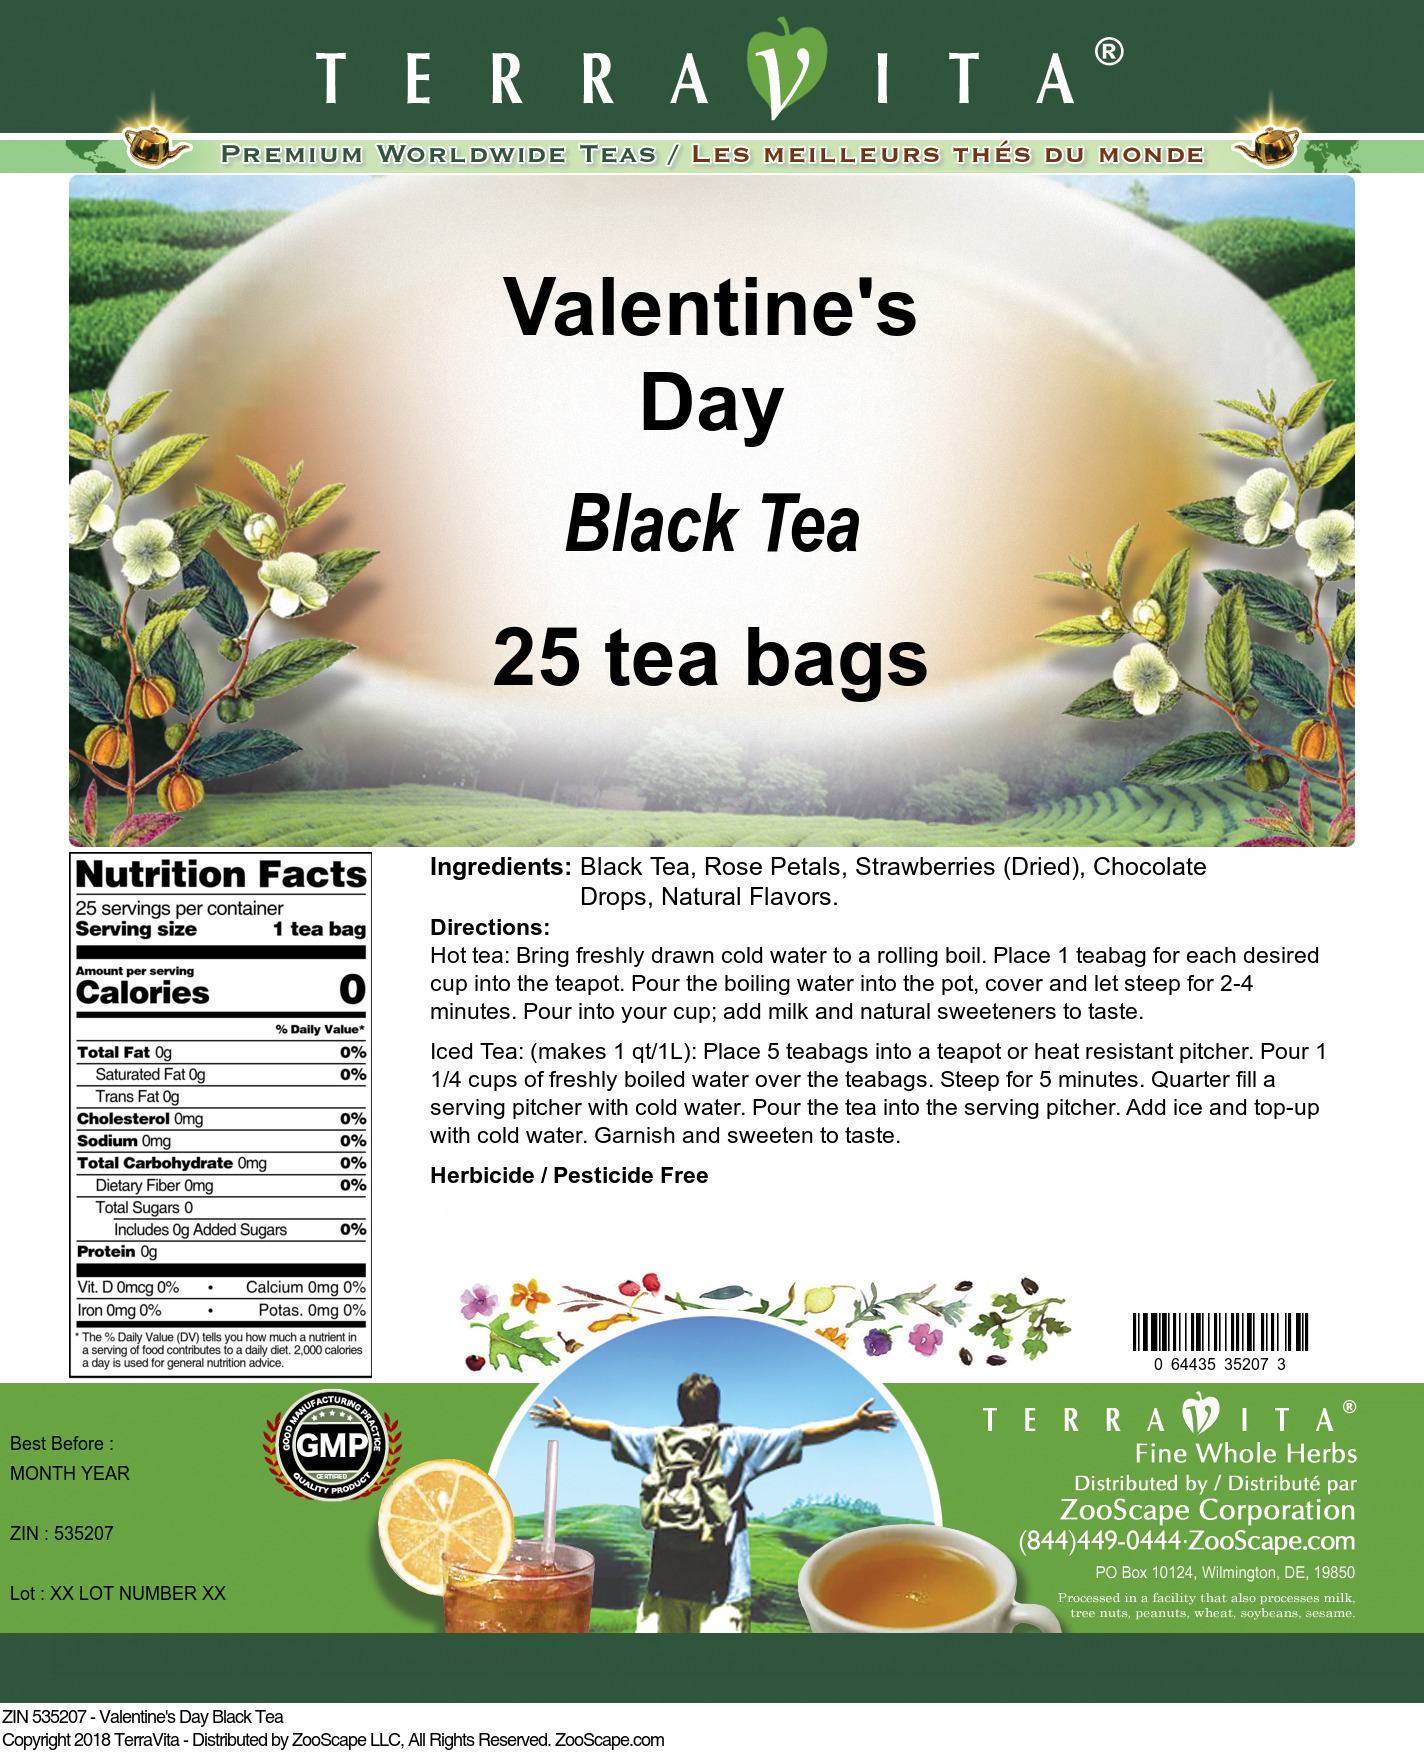 Valentine's Day Black Tea